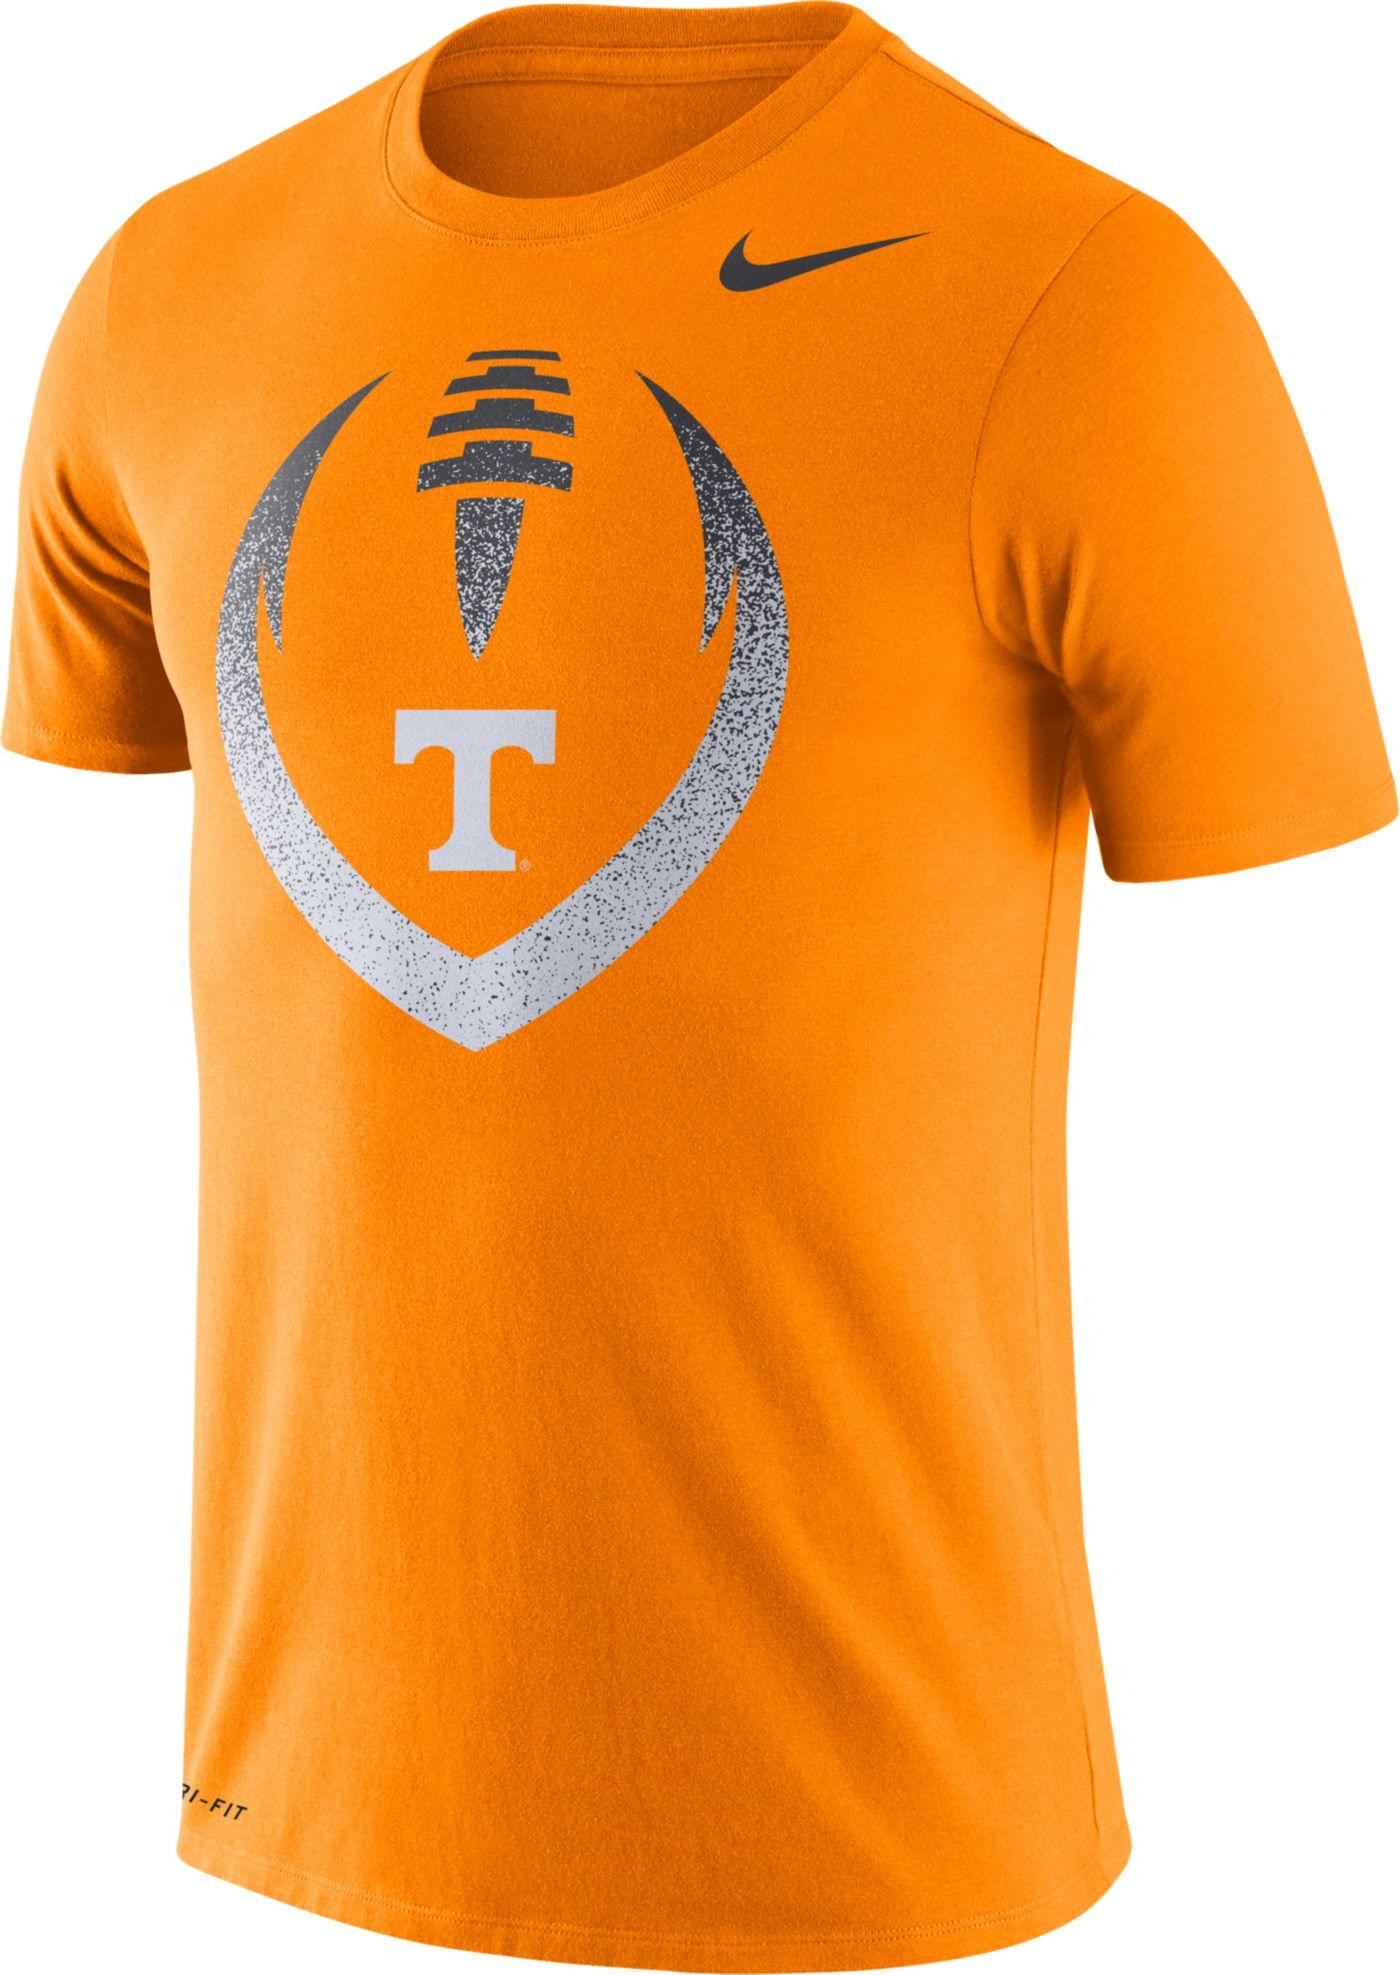 Nike Men's Tennessee Volunteers Tennessee Orange Dri-FIT Cotton Football Icon T-Shirt